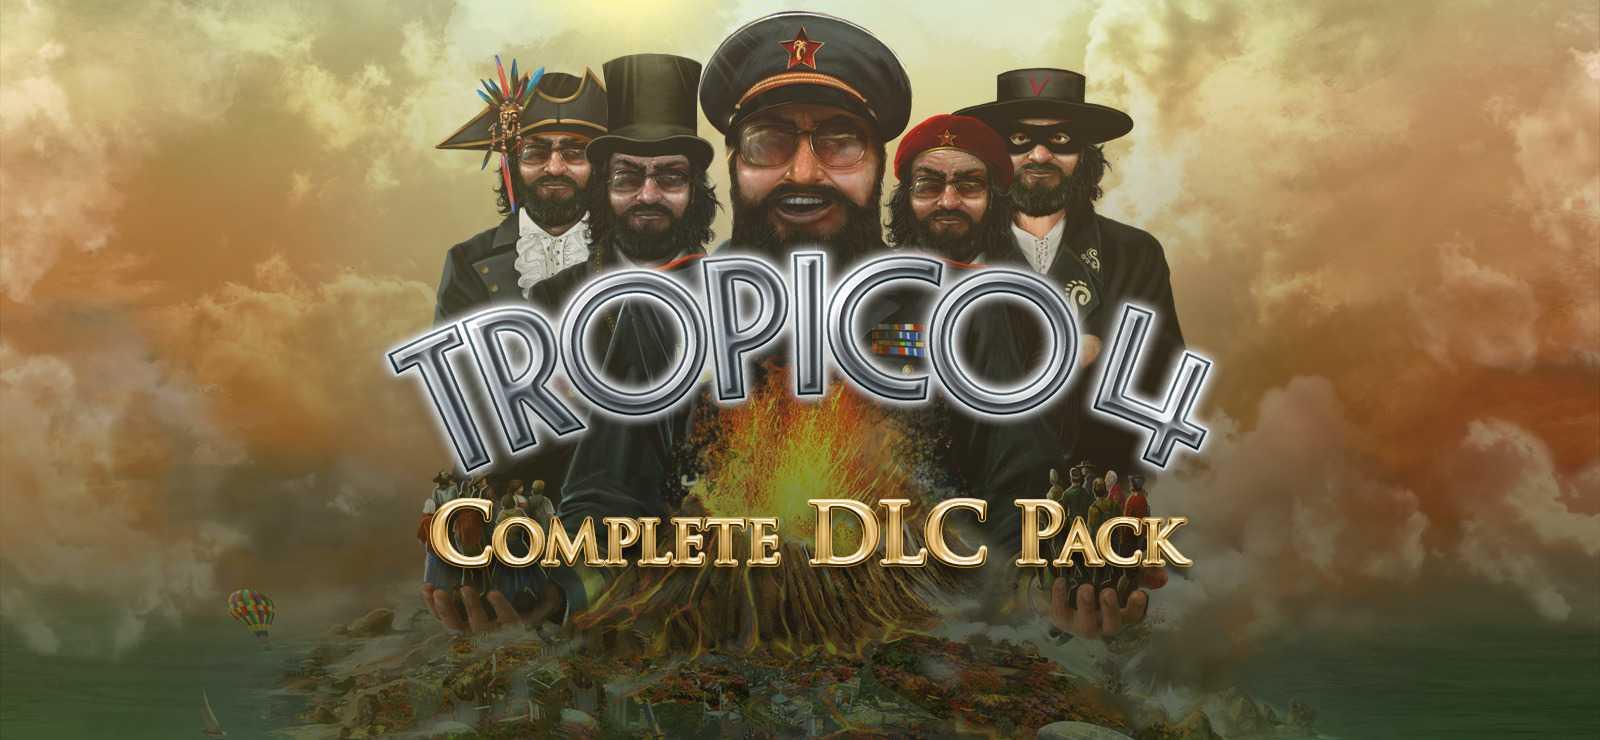 Tropico 4 - Complete DLC Pack